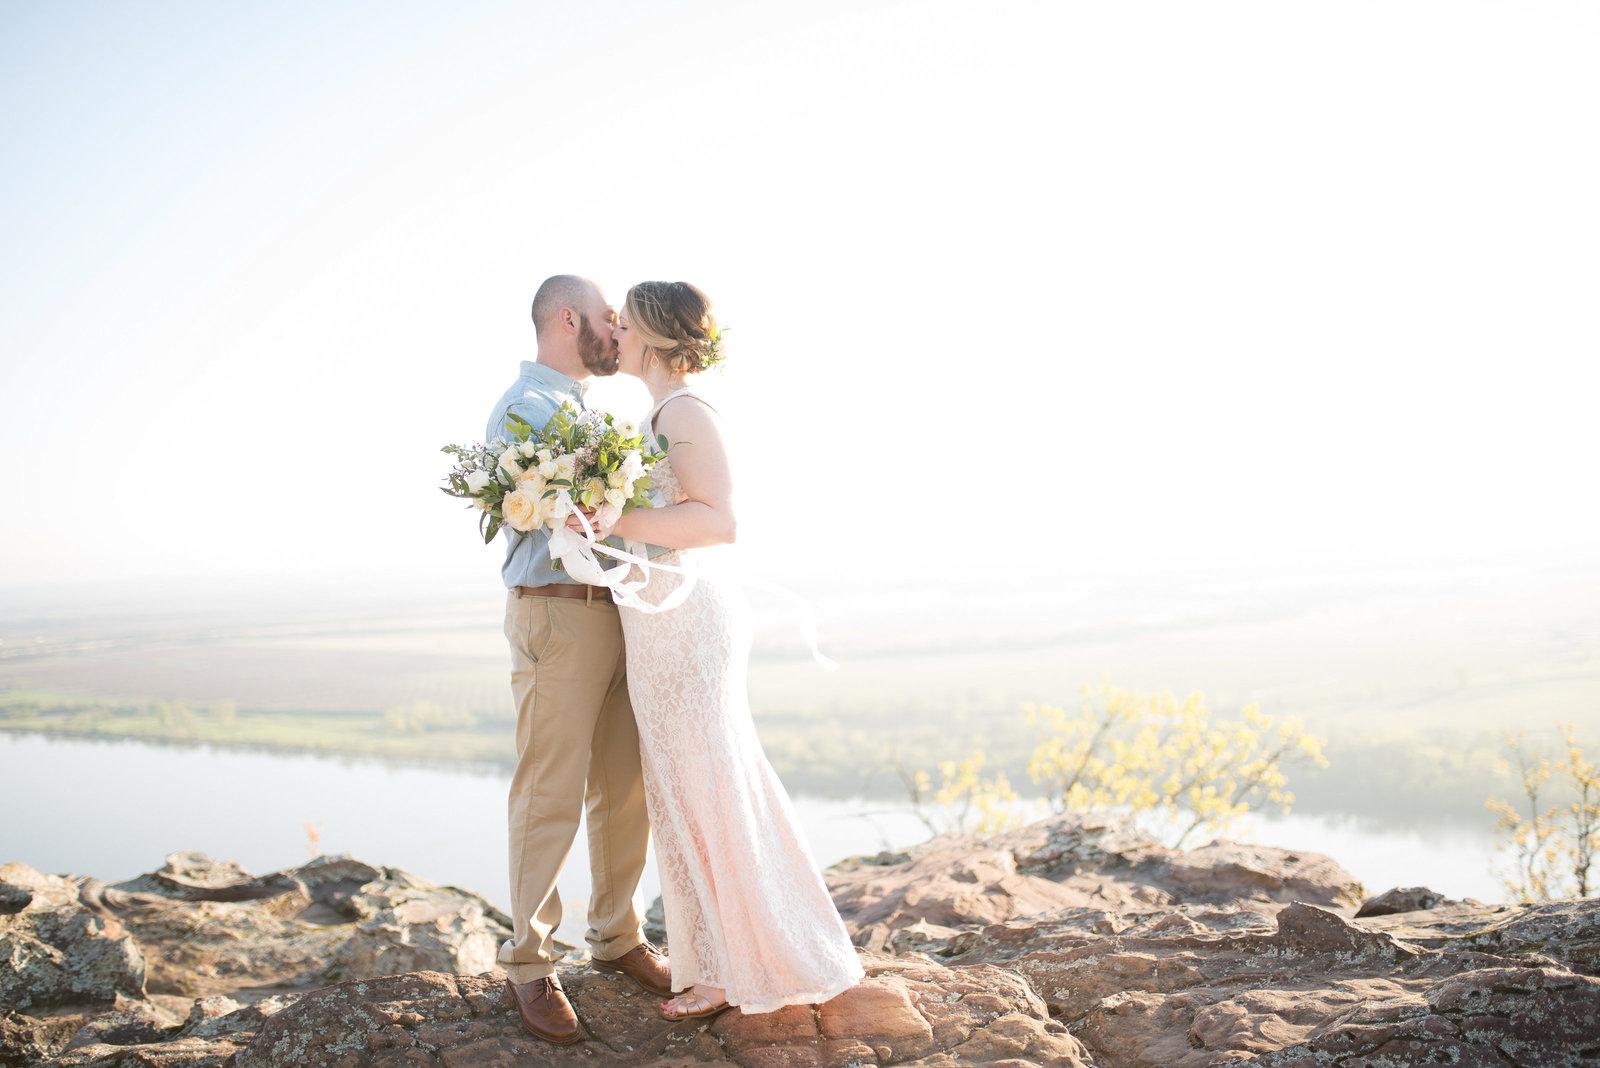 Simply Bliss Photography: Northwest Arkansas Wedding Photographer